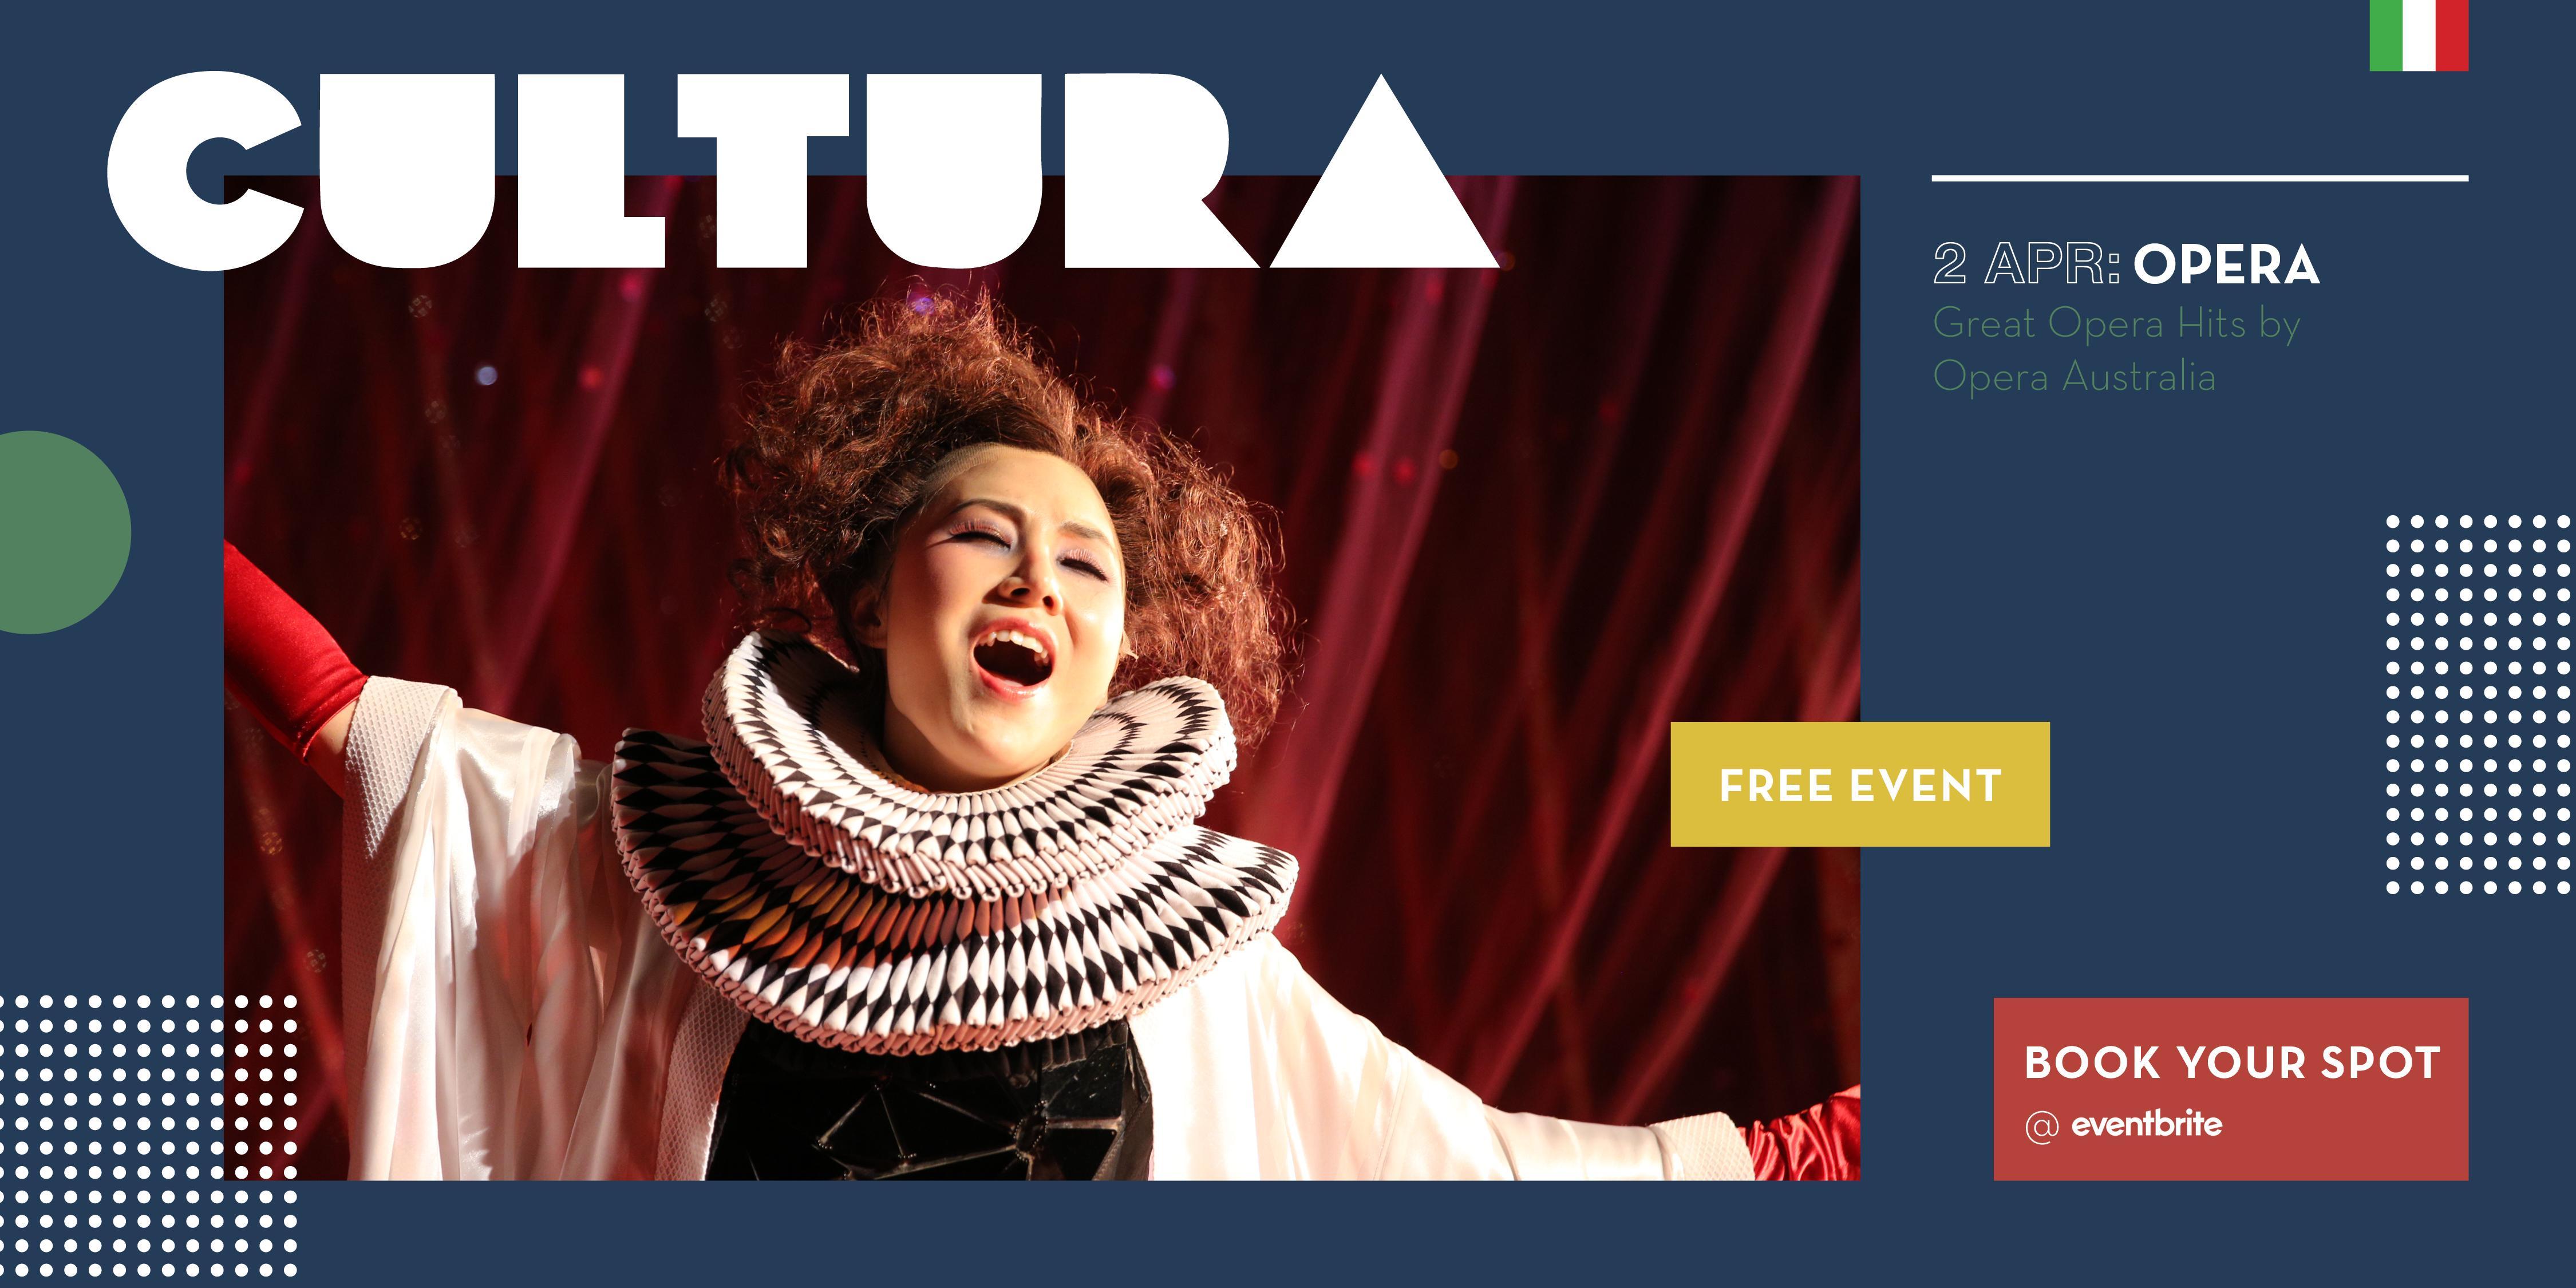 CULTURA - Great Opera Hits by Opera Australia